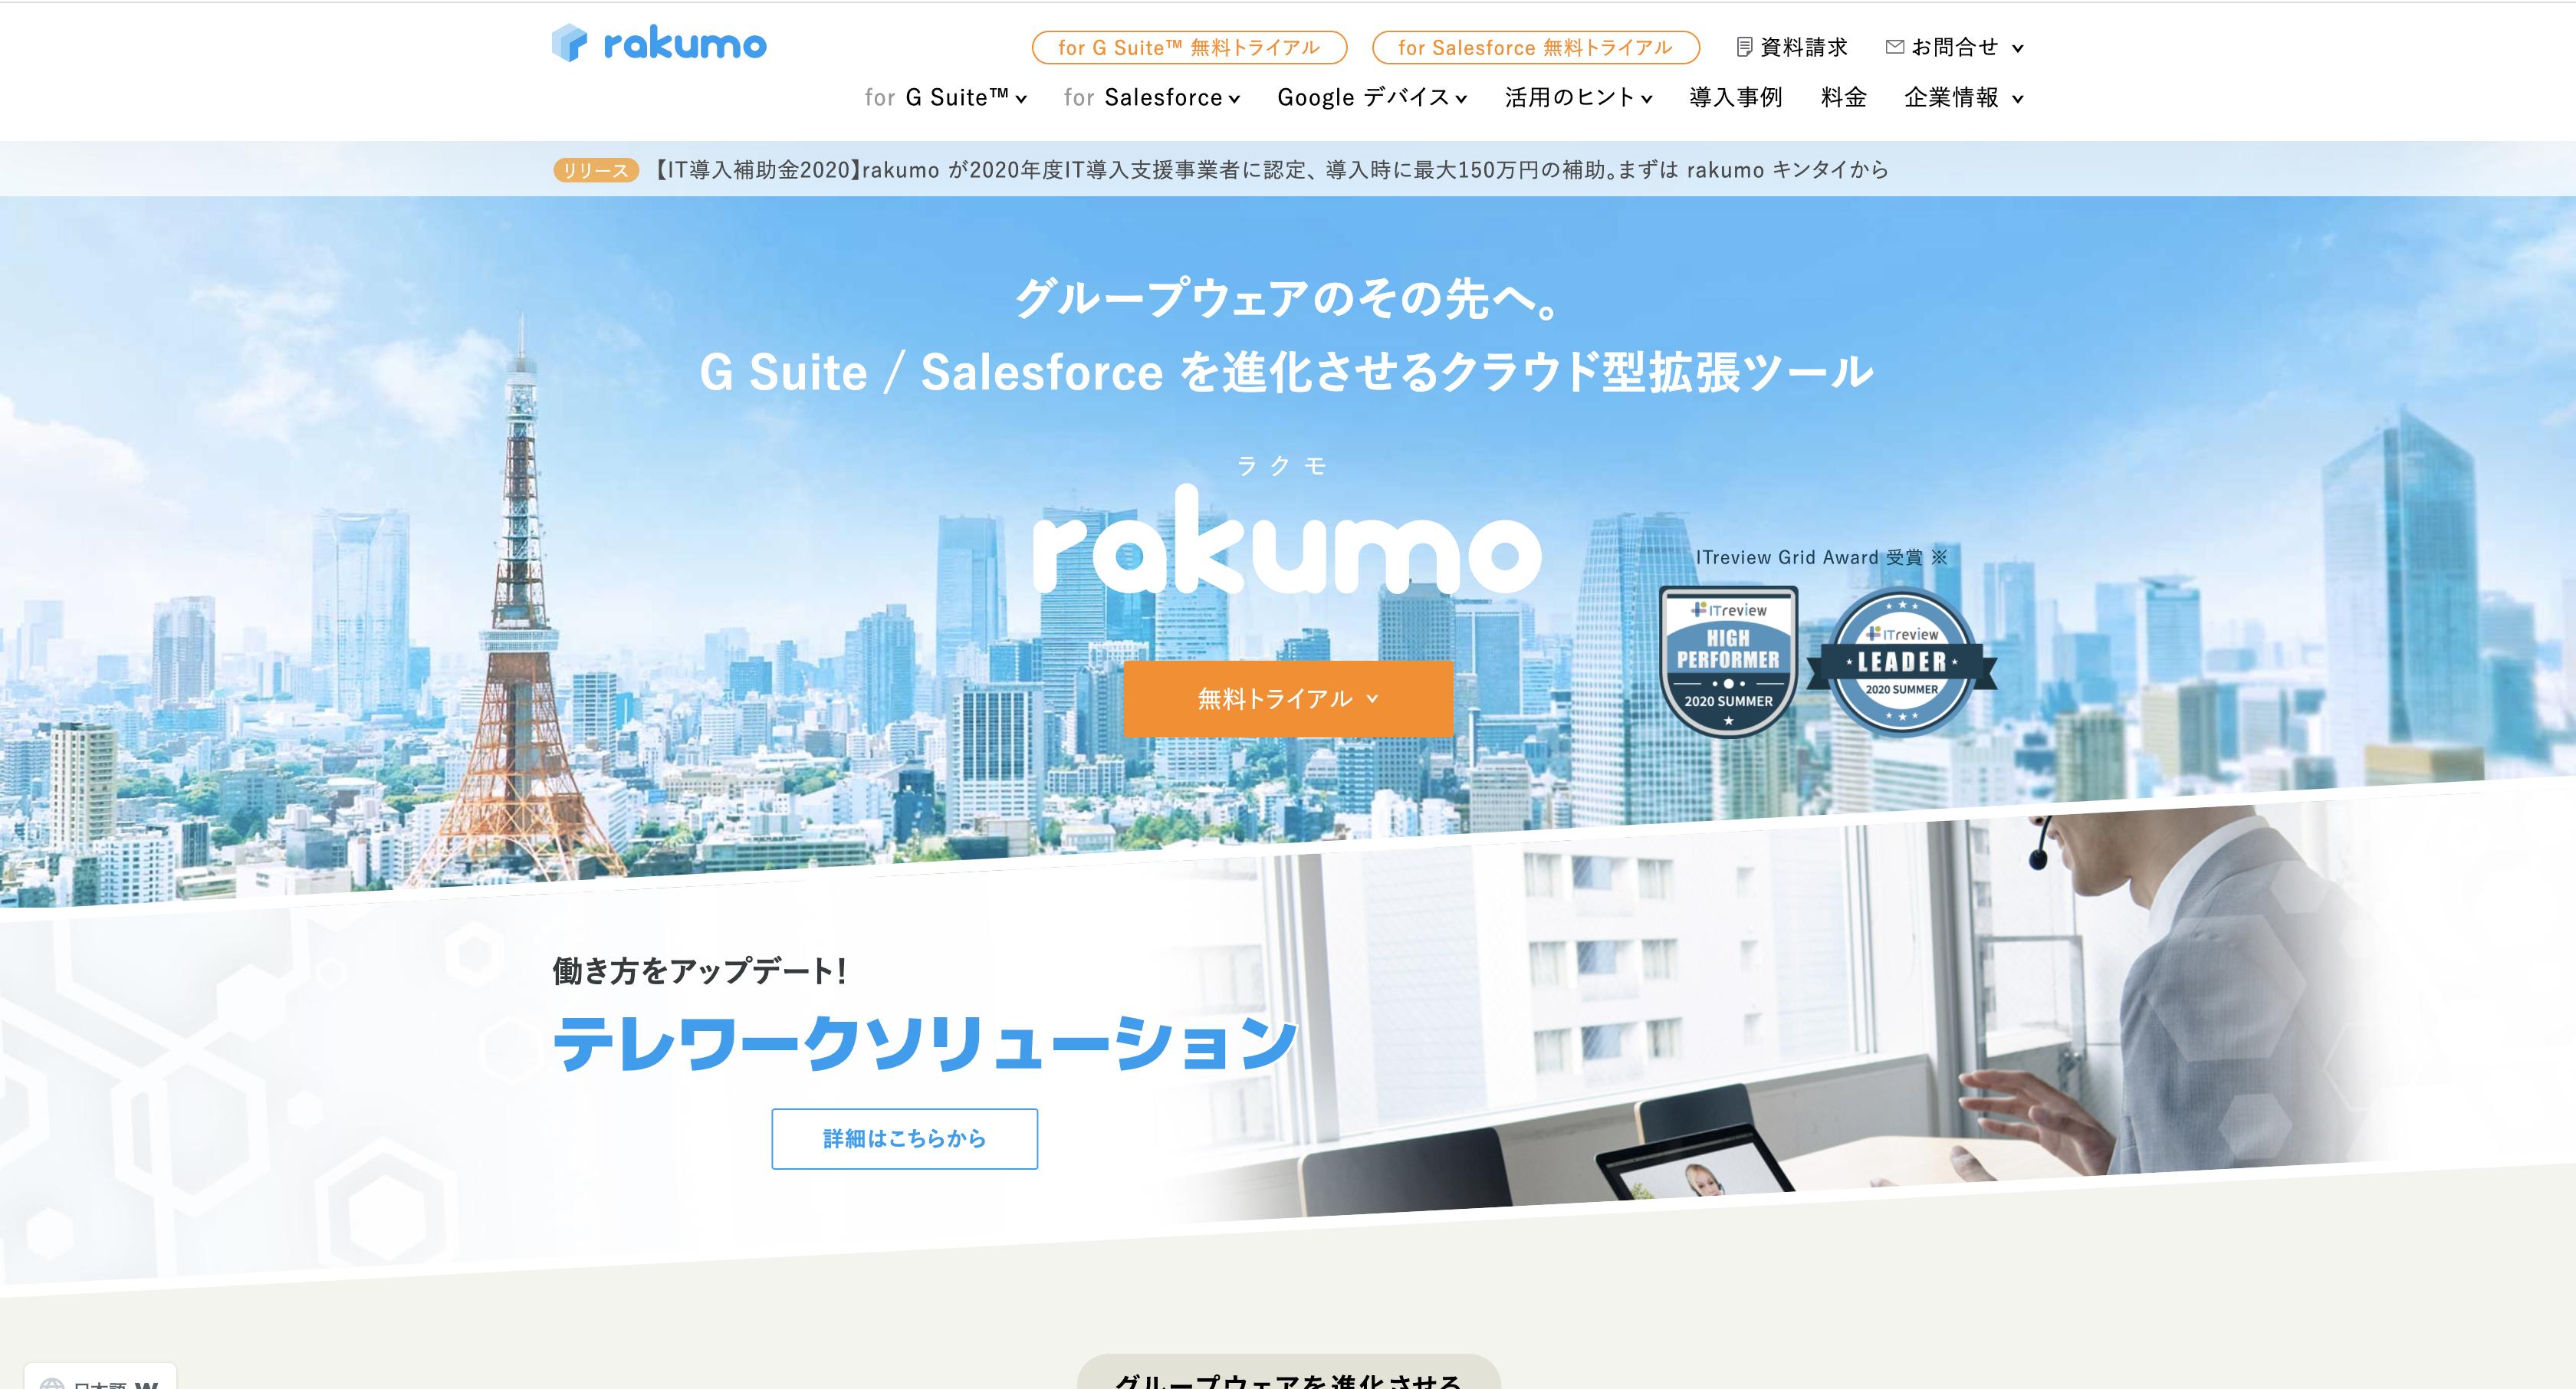 G Suiteと連動して勤怠管理や稟議・経費精算などを利用できるサービス【rakumo】